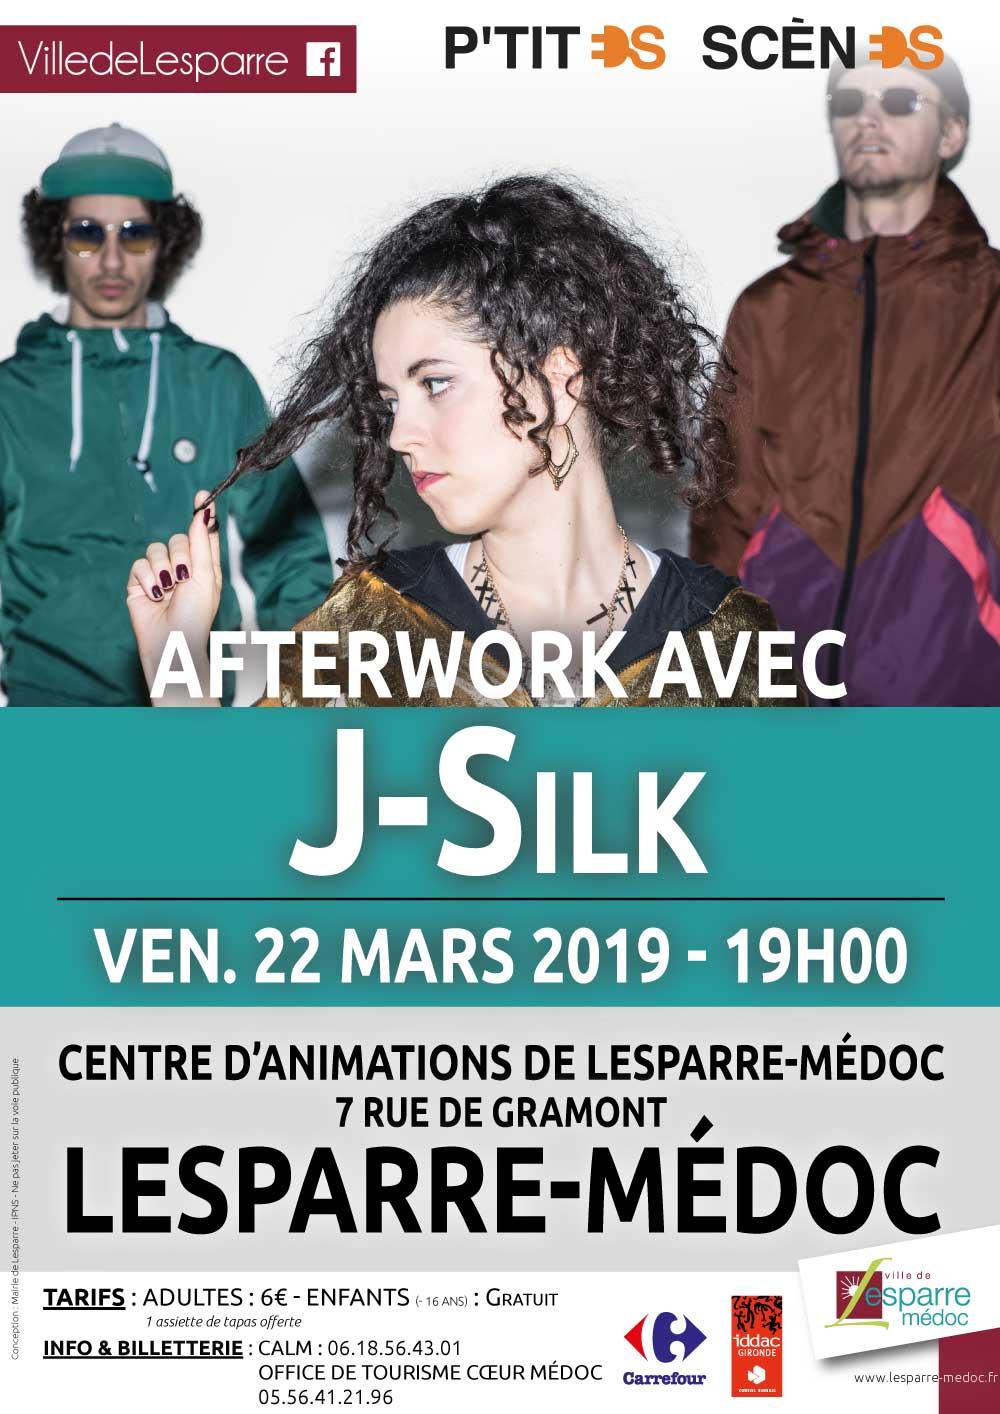 2019.03.22---AW-JSilk_V1.1